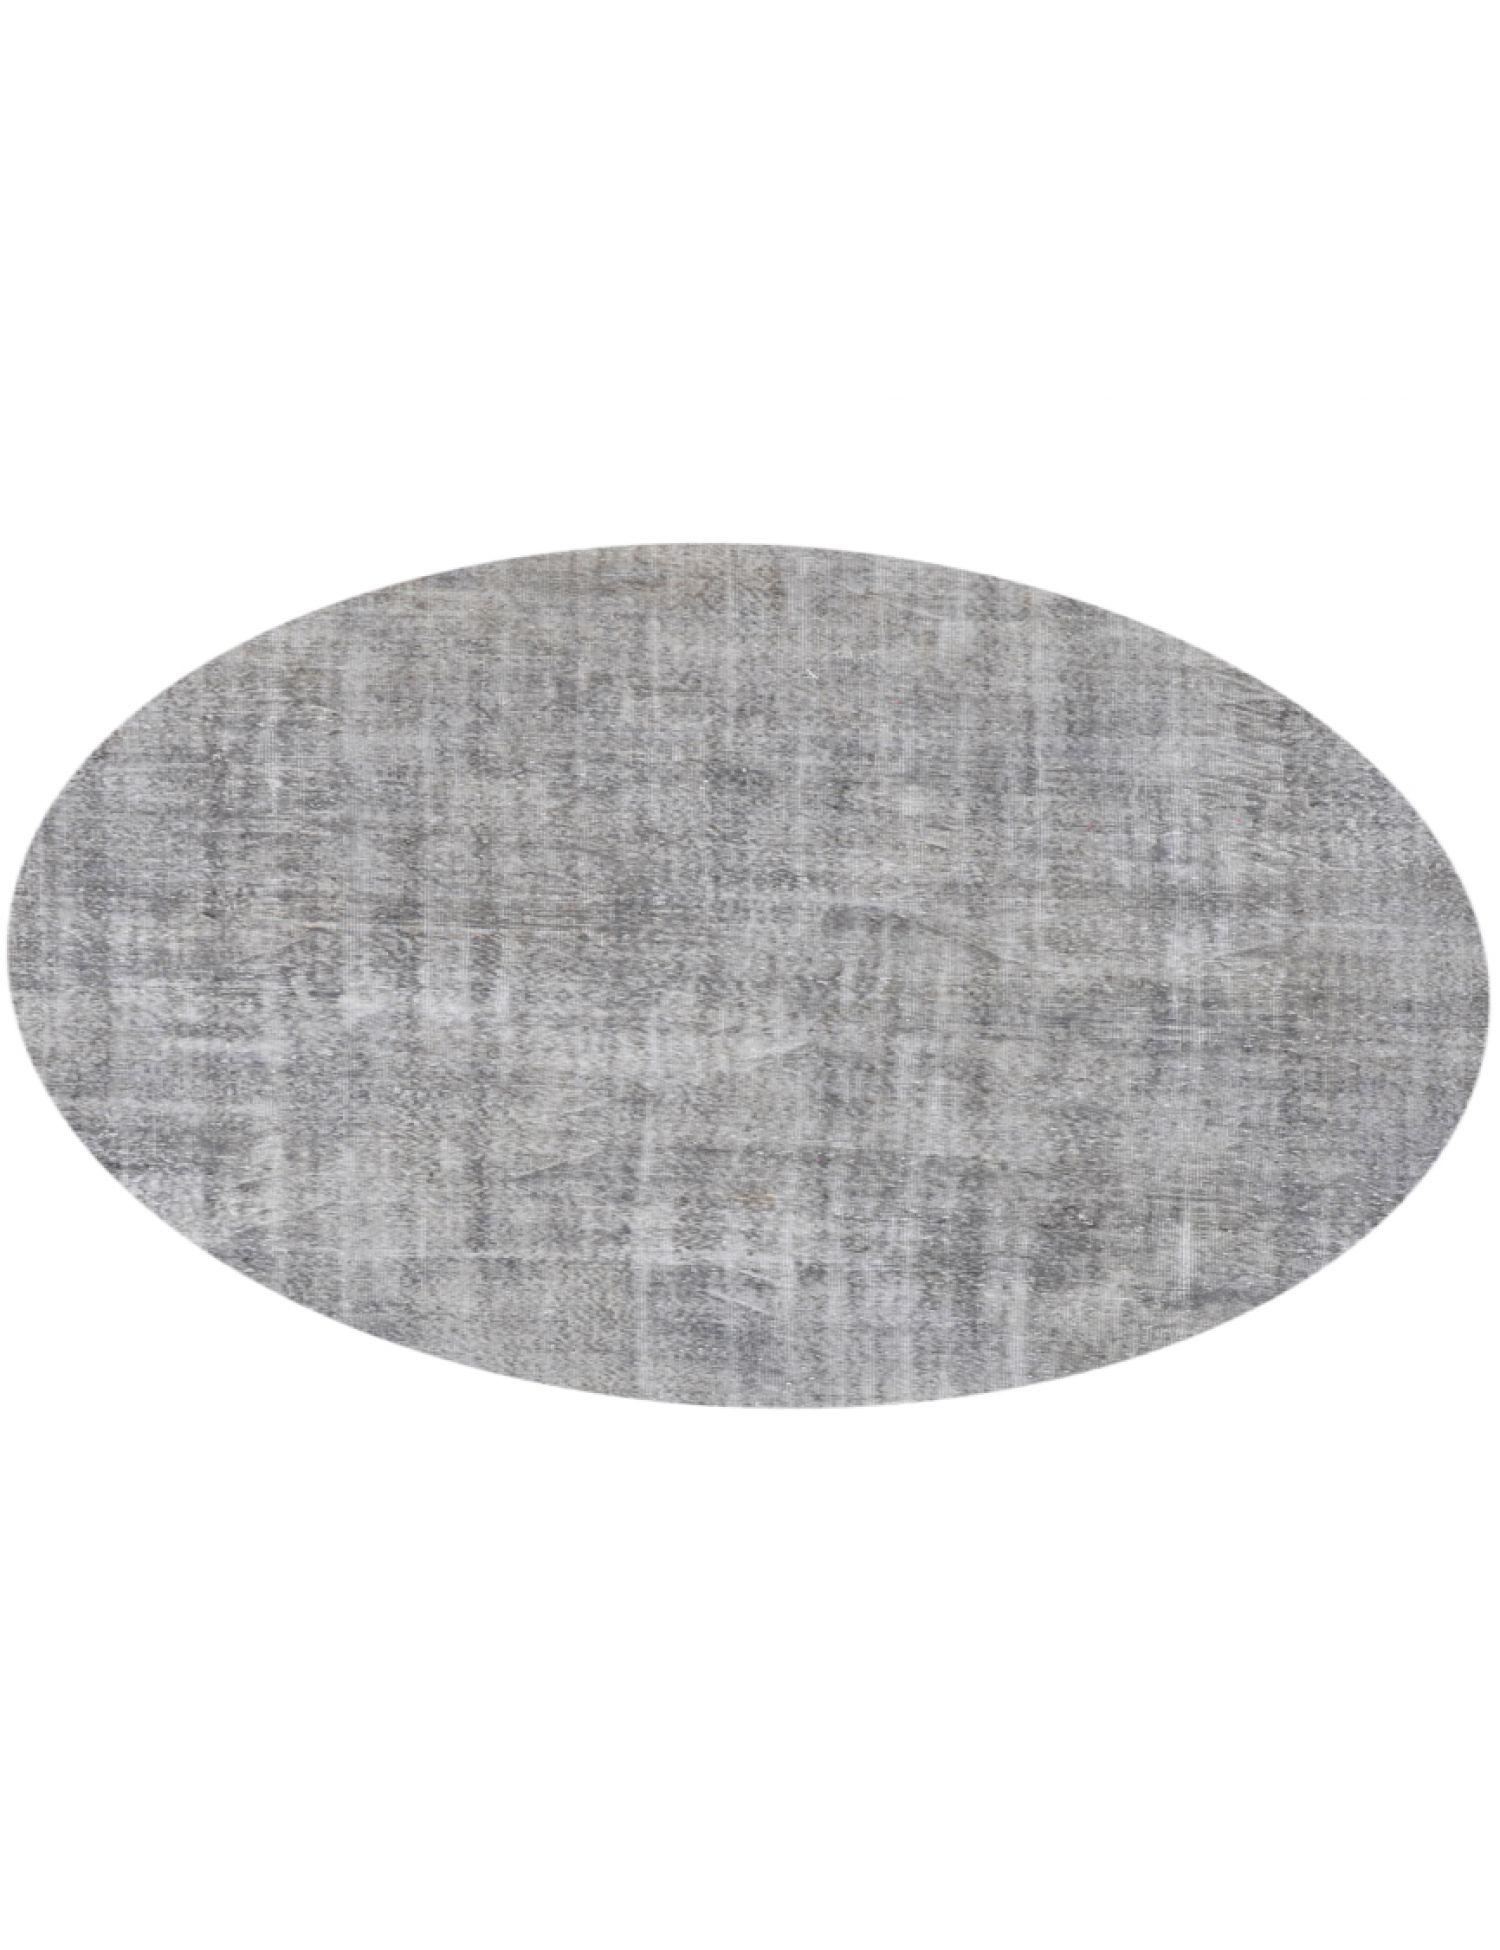 Tappeto Vintage  grigio <br/>243 x 243 cm